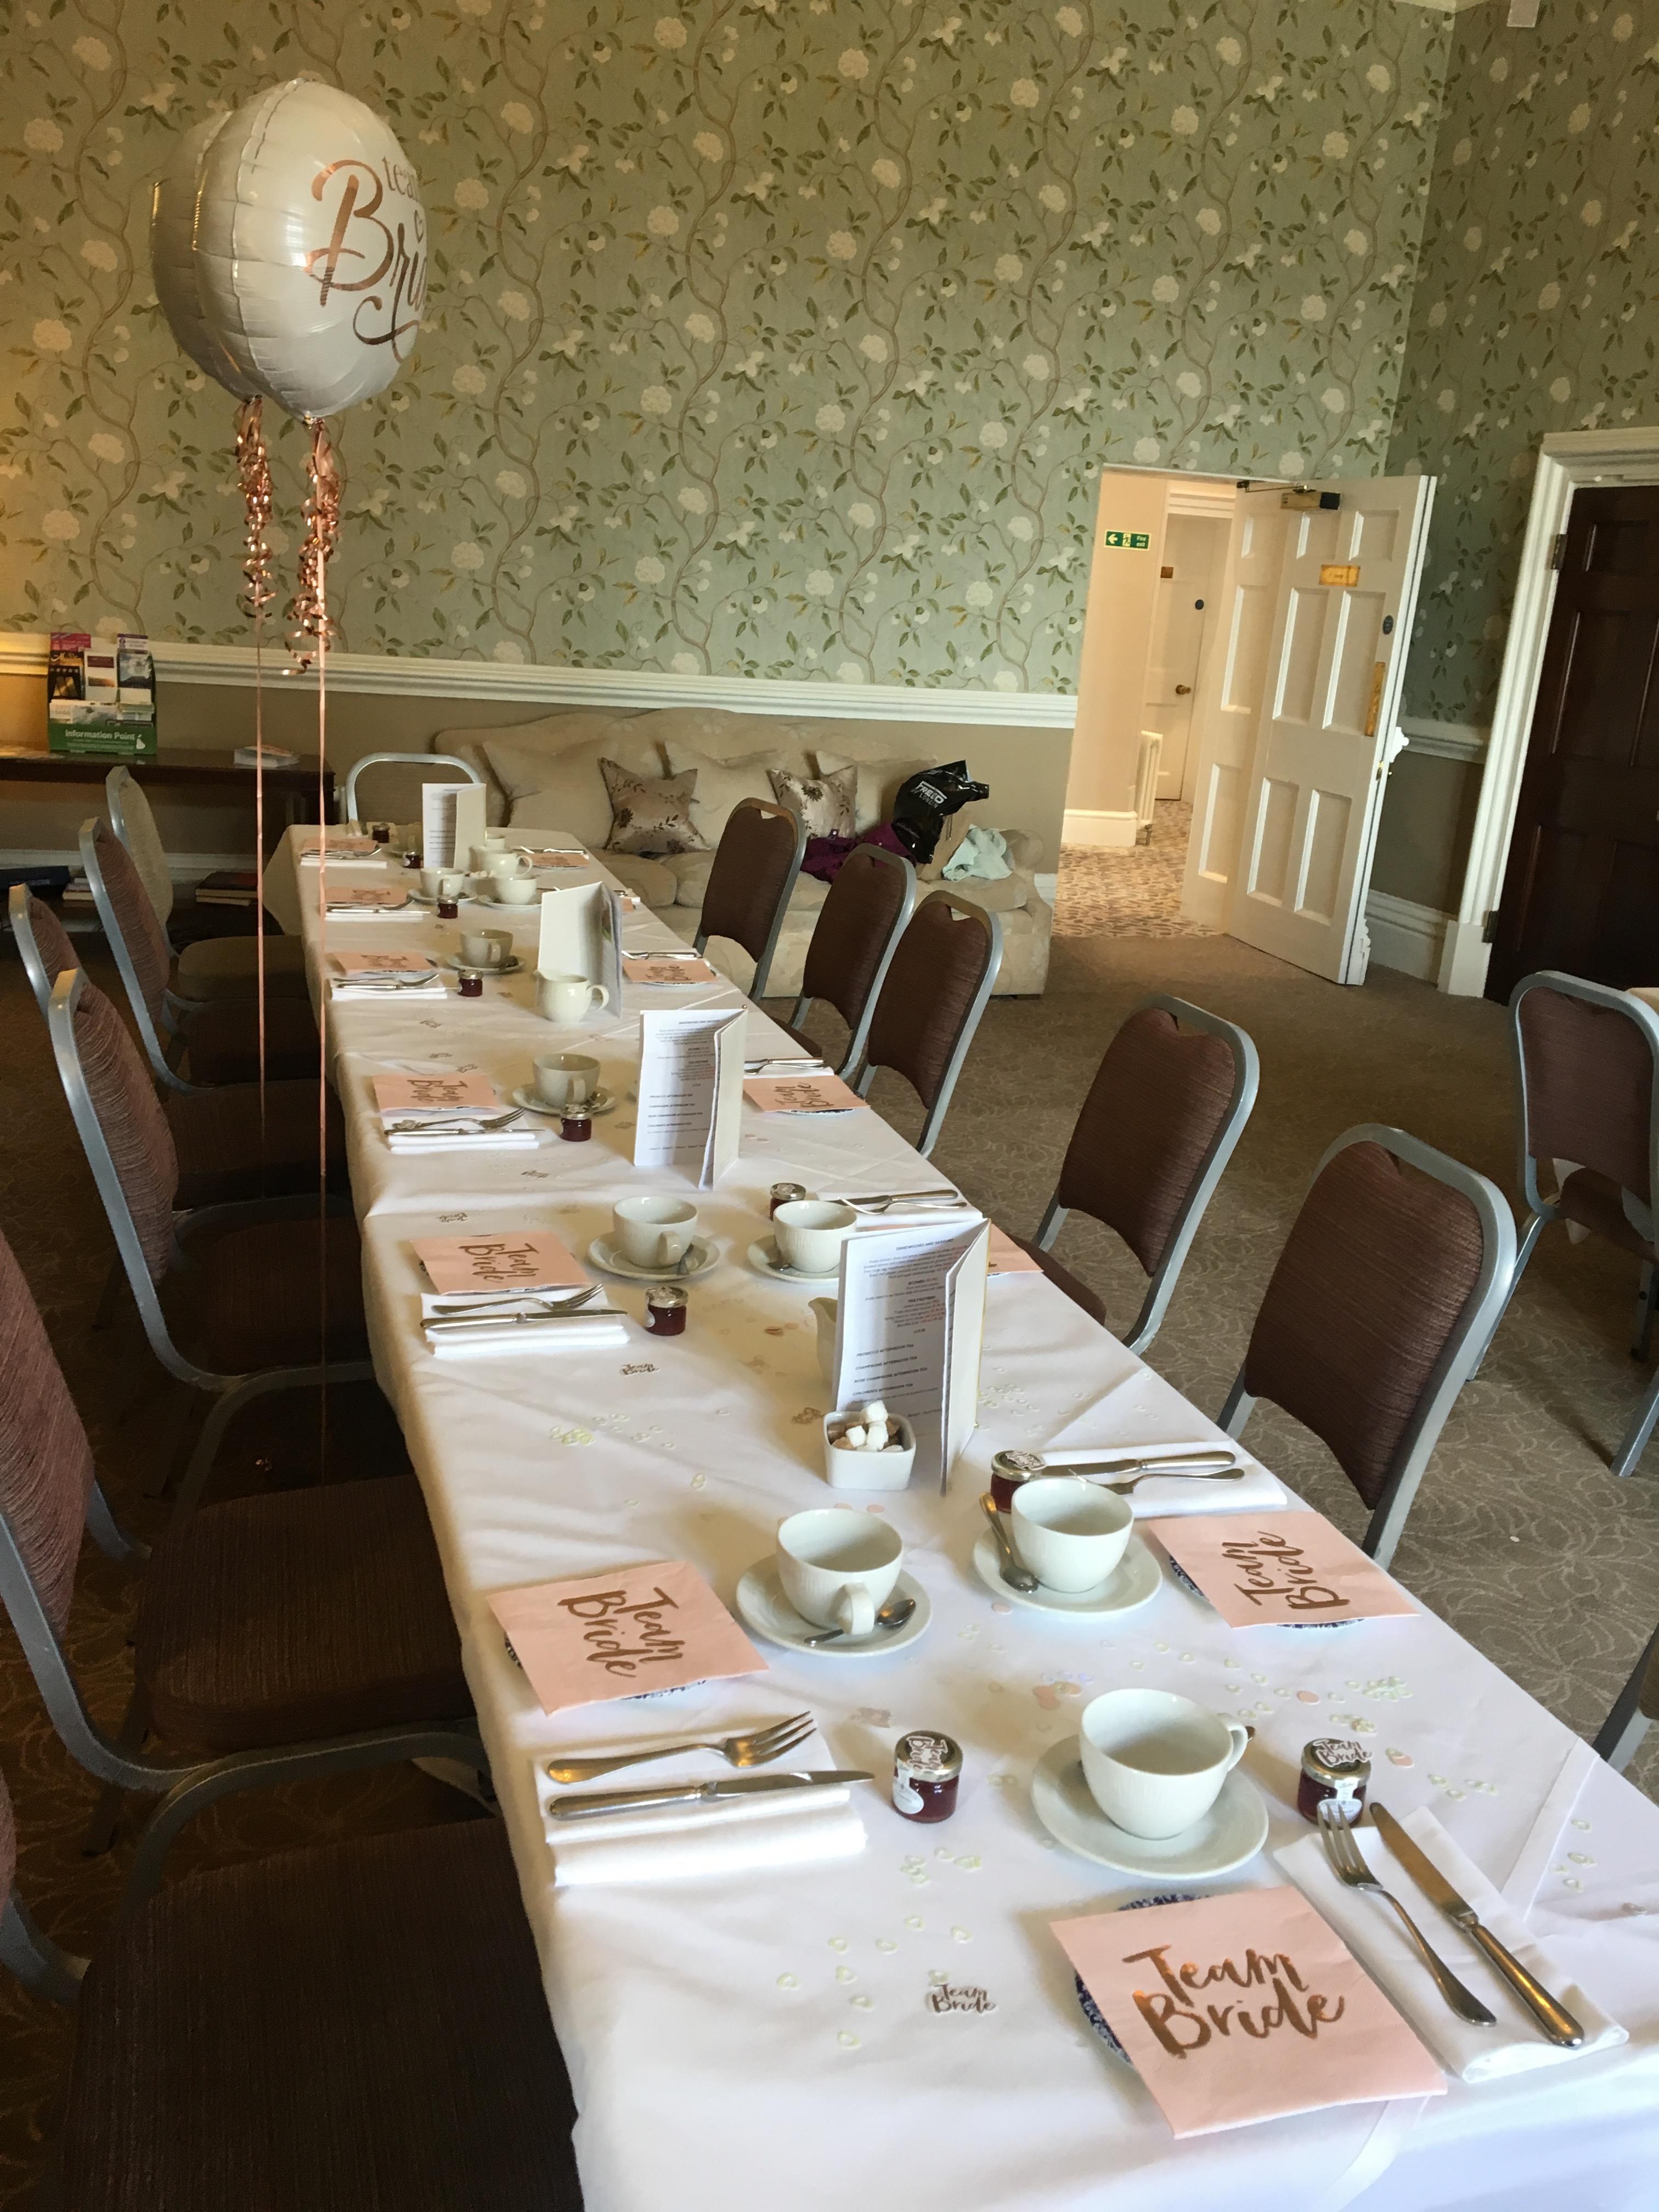 Afternoon tea table set up